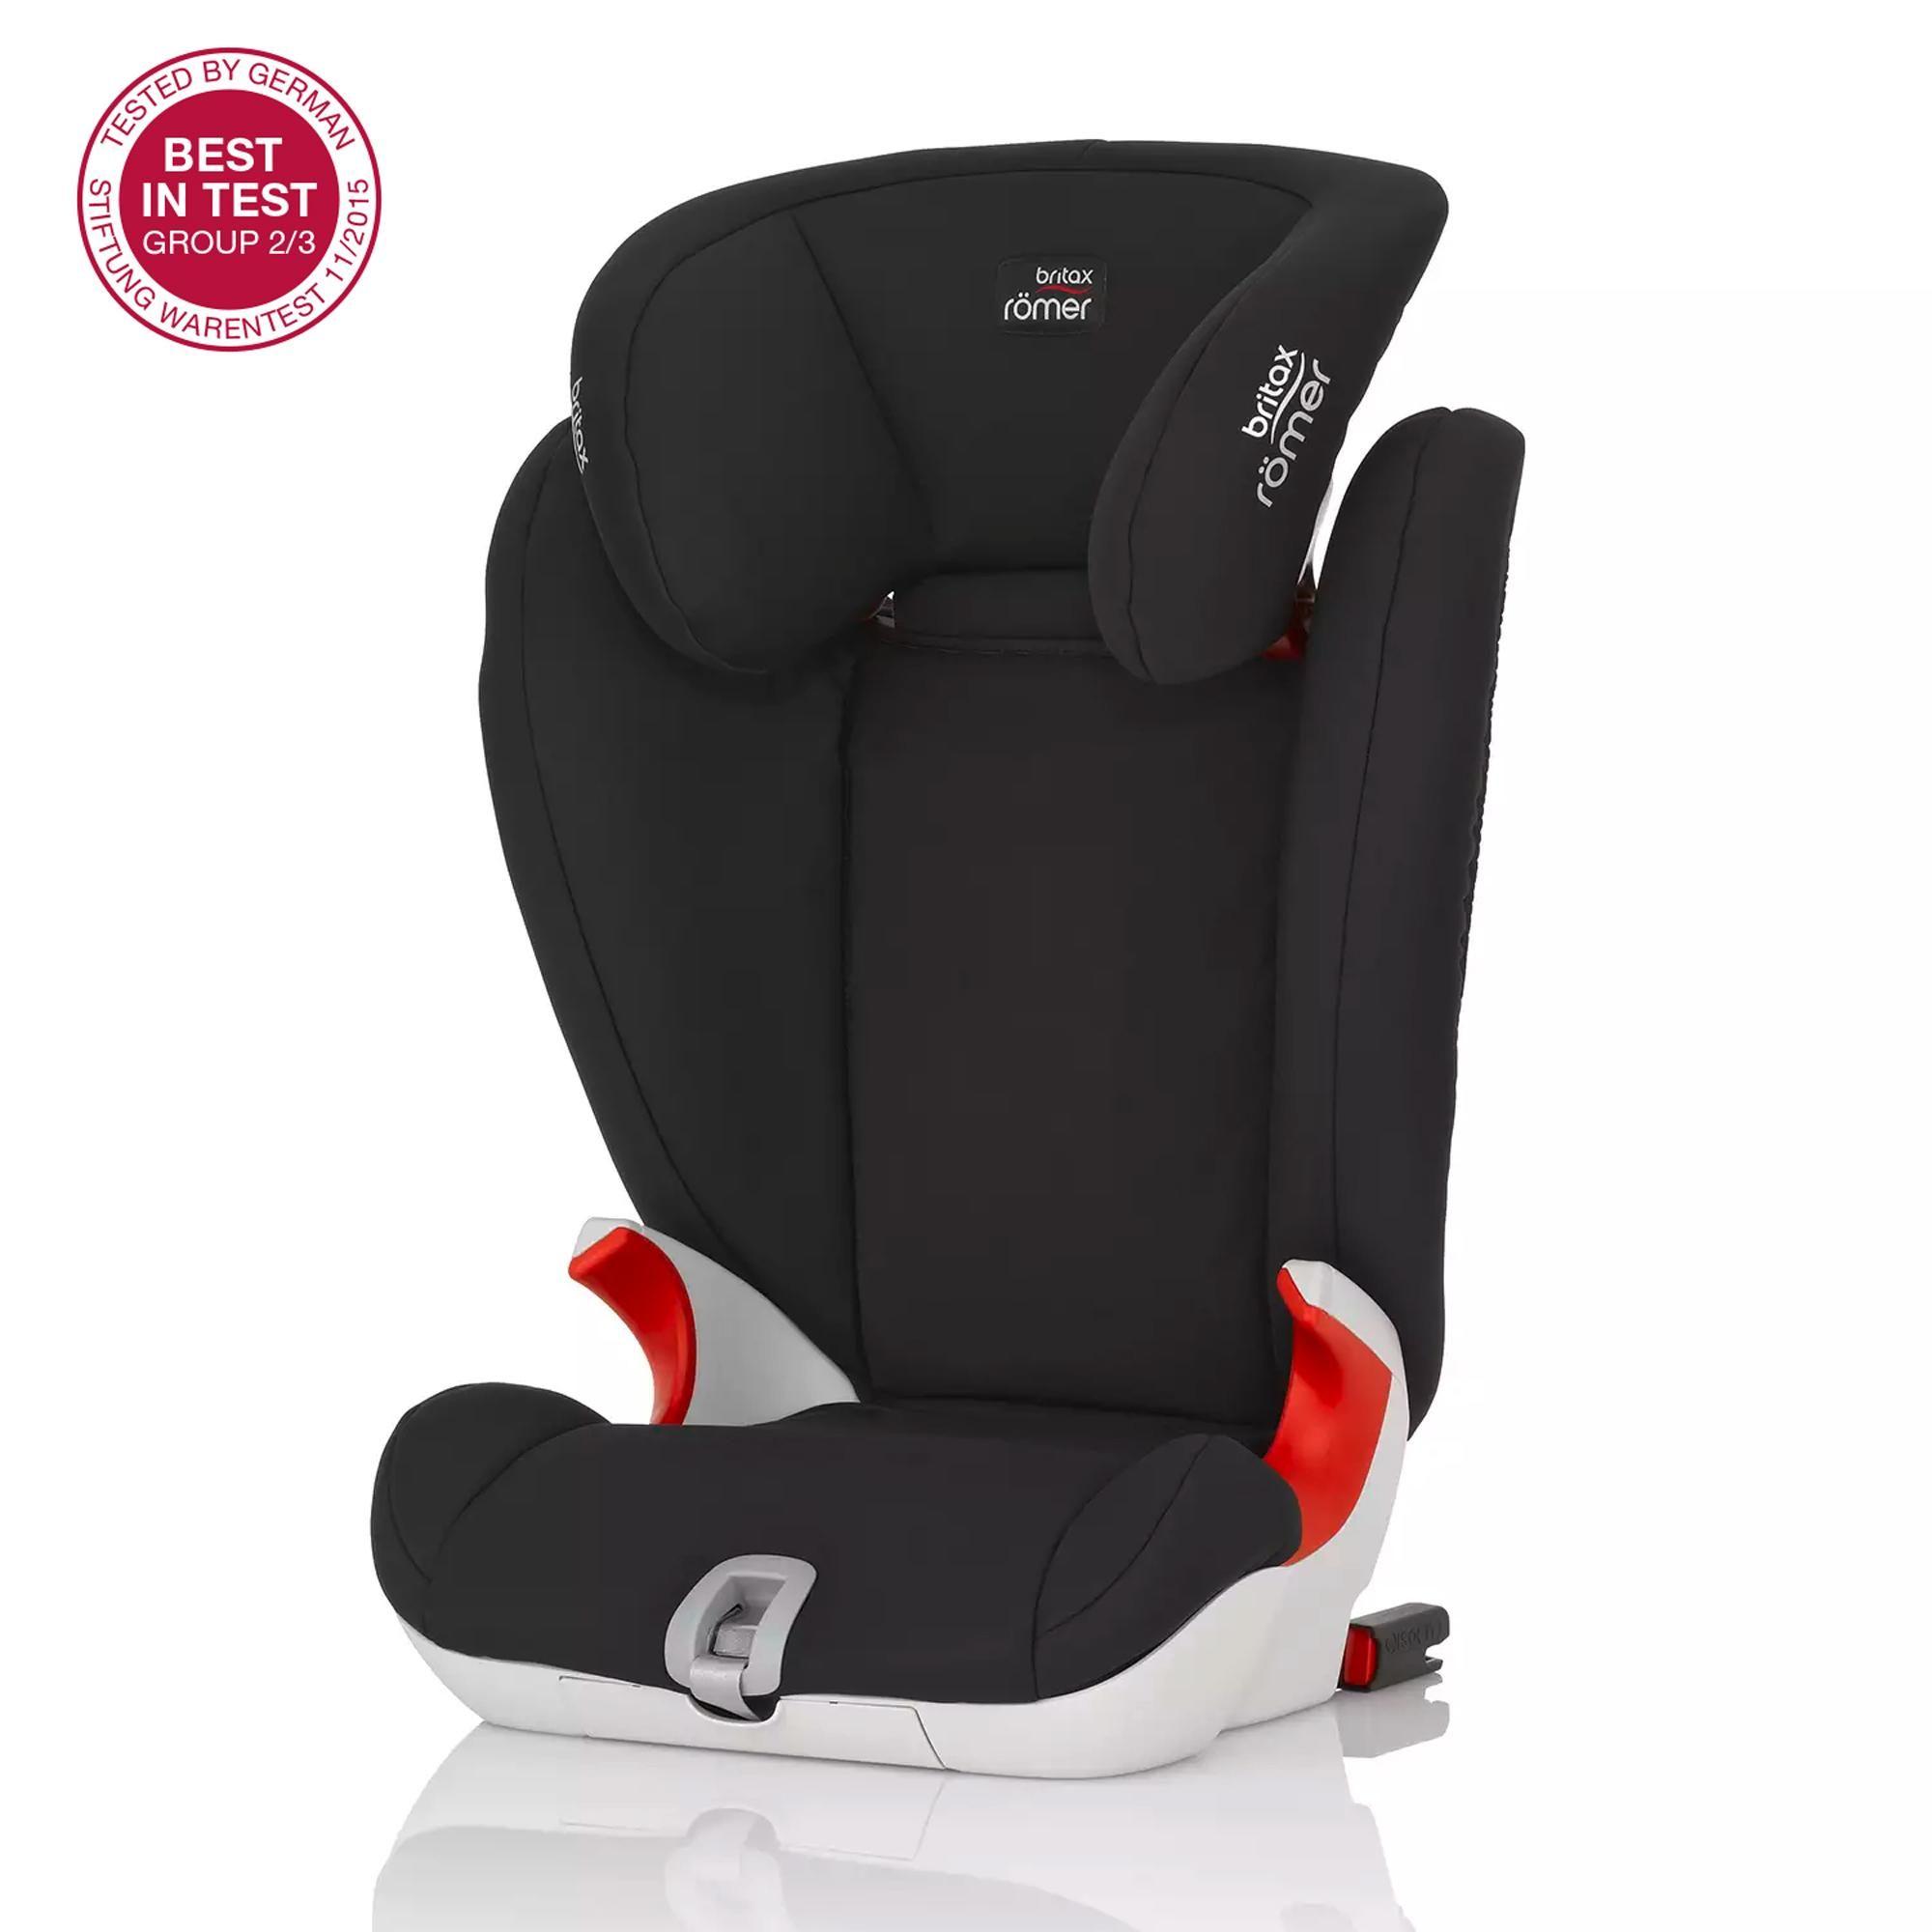 Britax Romer Kidfix Sl Group 2 3 Cosmos Black Car Seat Car Seats Baby Car Seats Booster Car Seat